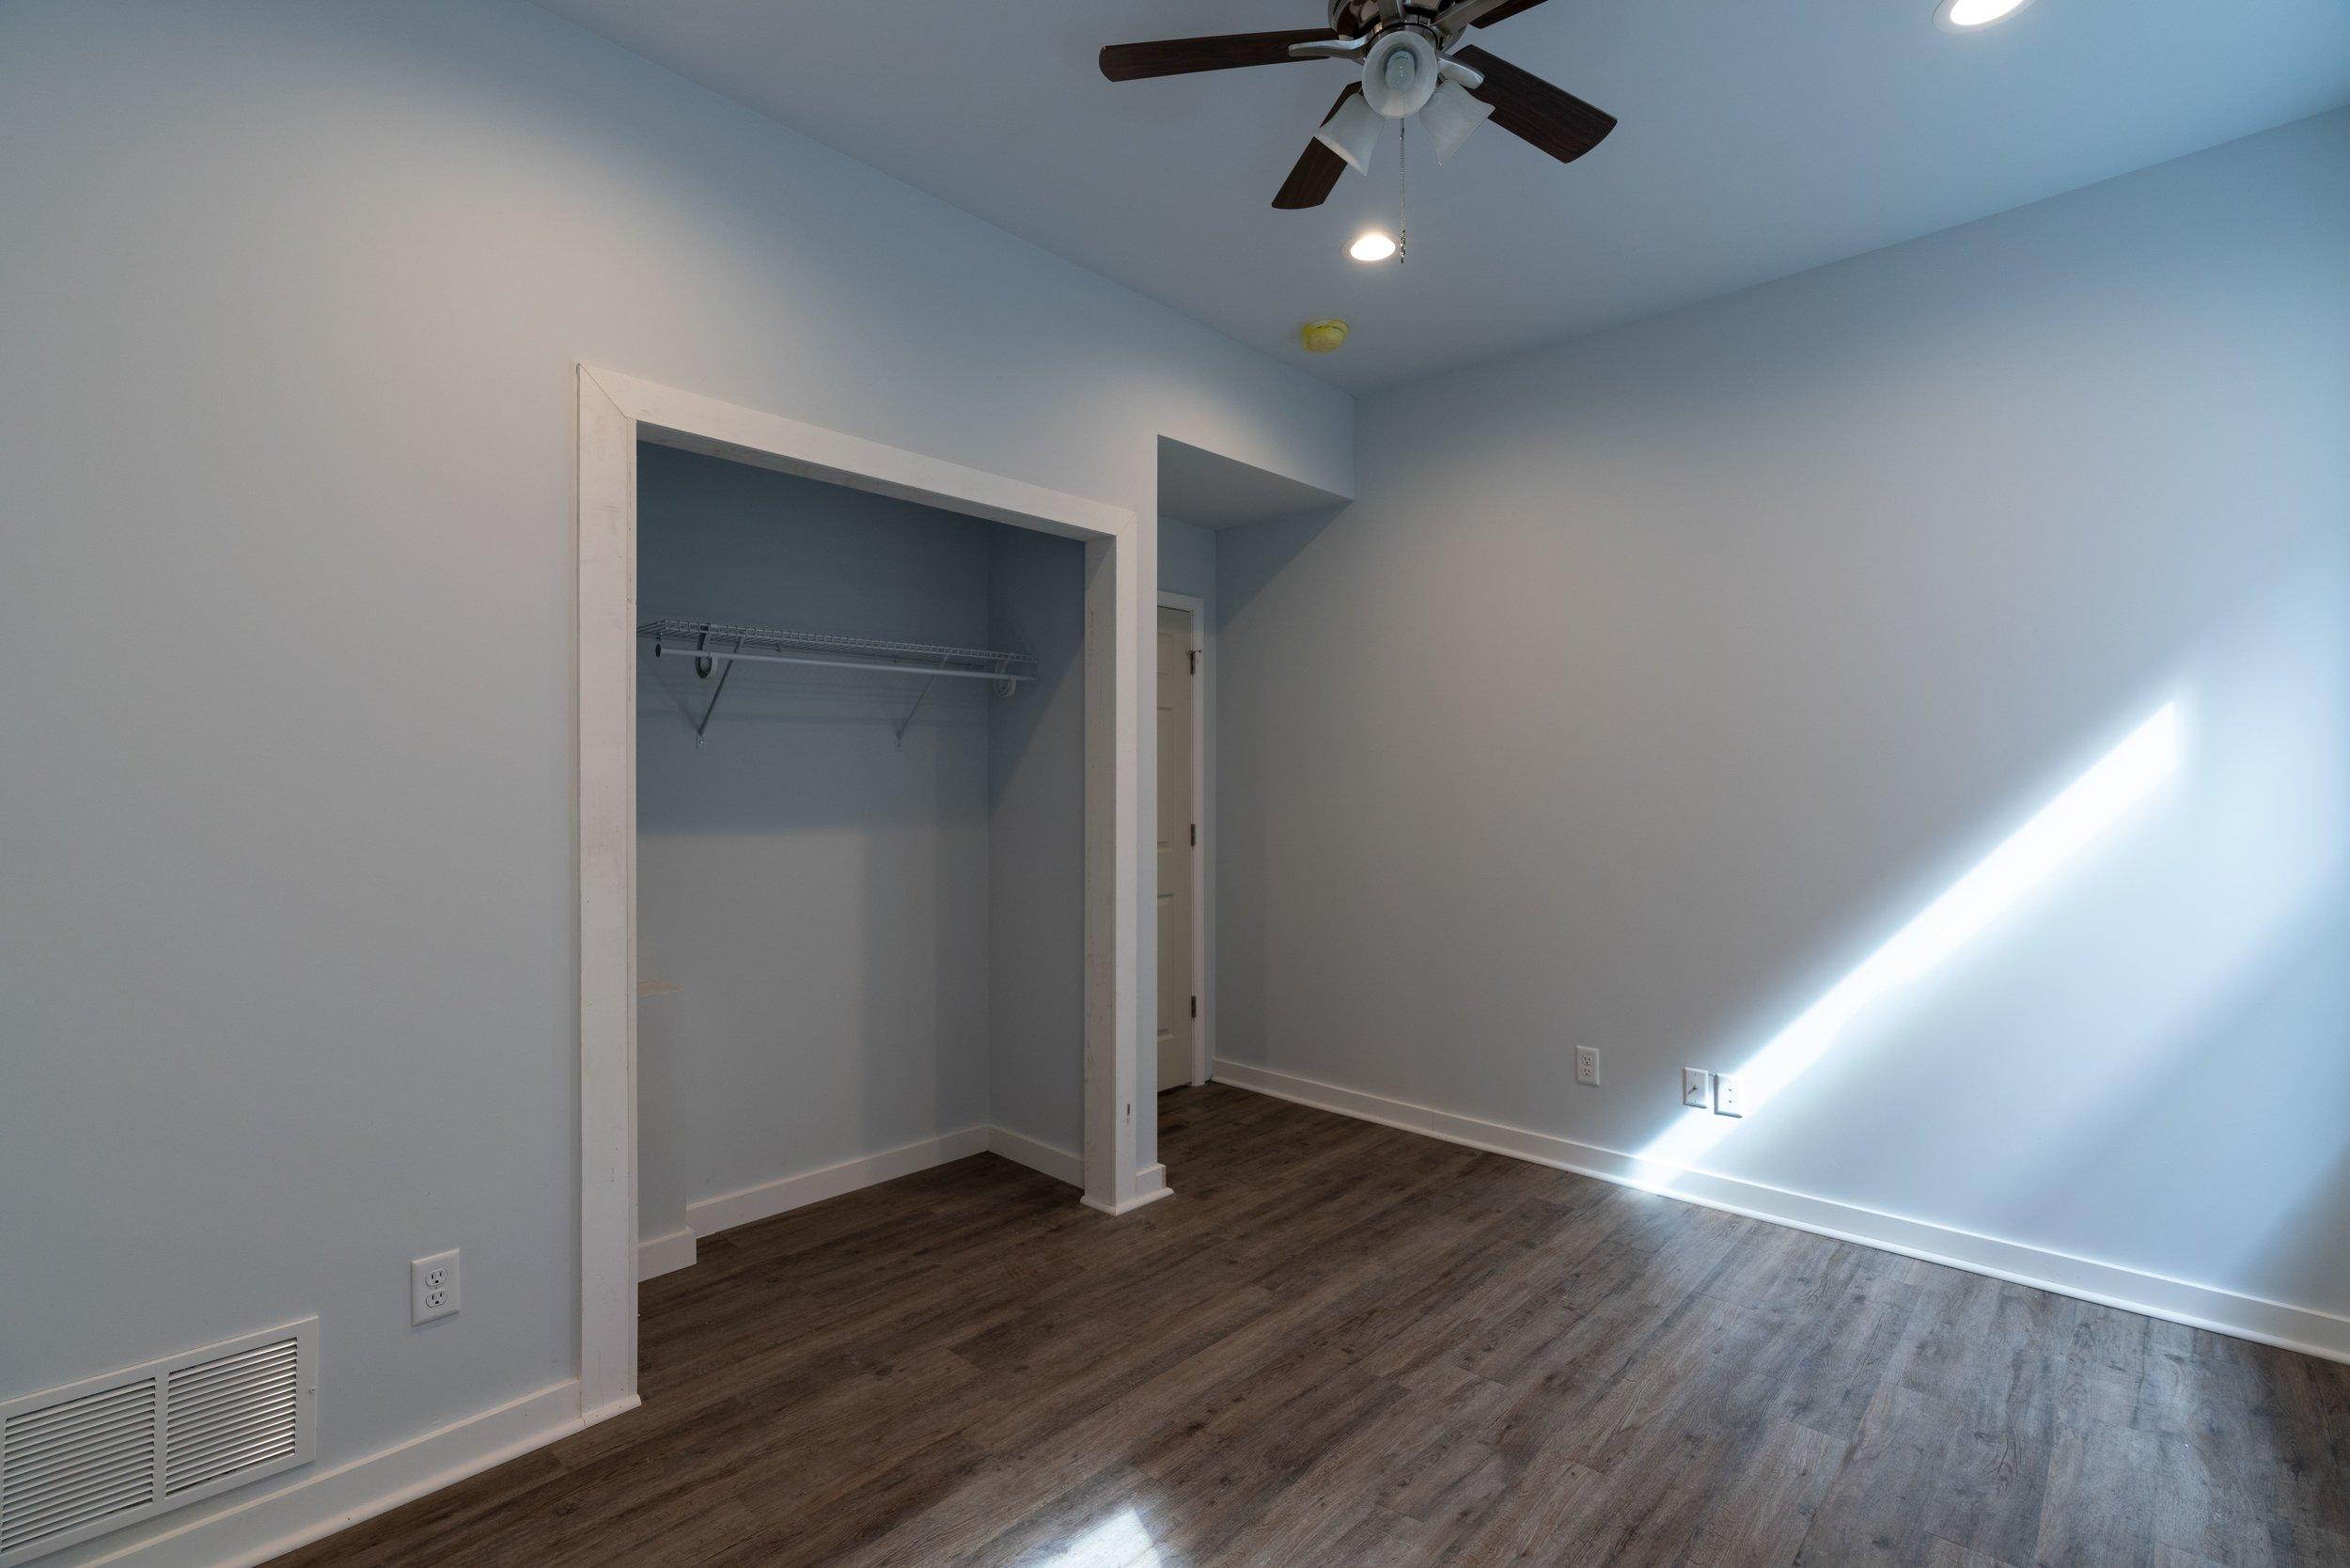 Real Estate-7-min.jpg